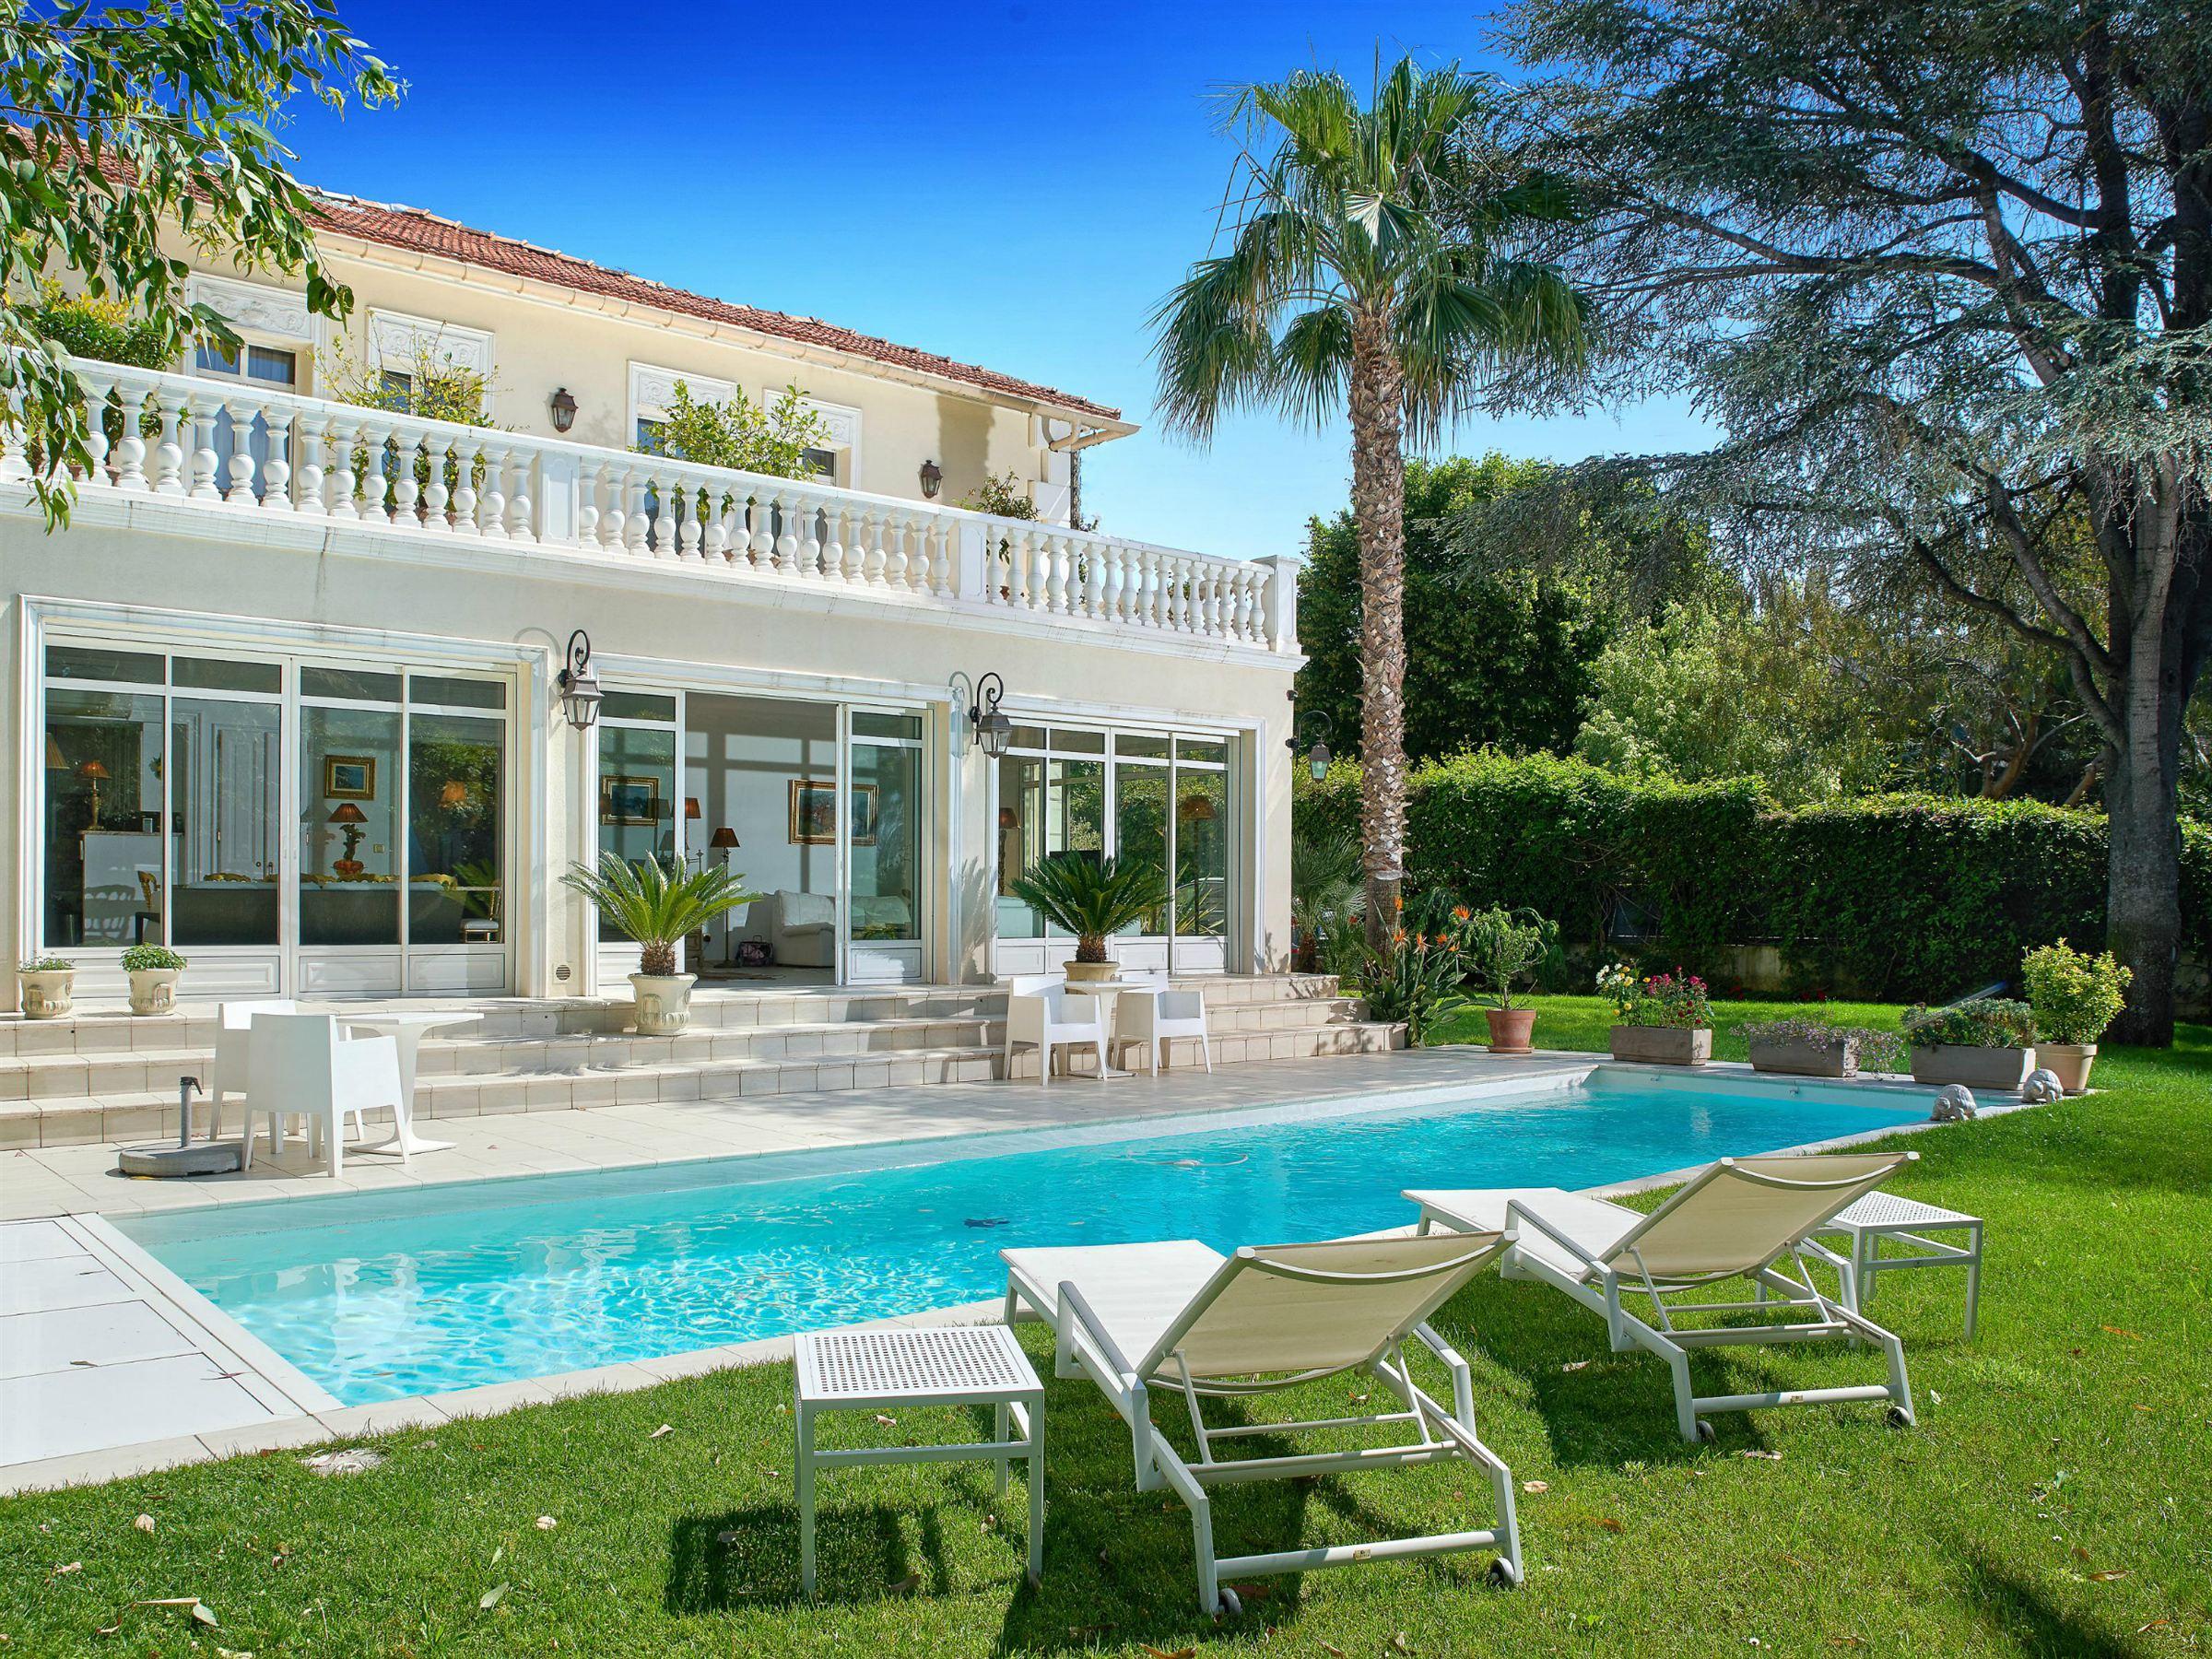 Casa Unifamiliar por un Venta en Charming villa located in the sought after 'Basse Californie' in Cannes Cannes, Provincia - Alpes - Costa Azul 06400 Francia